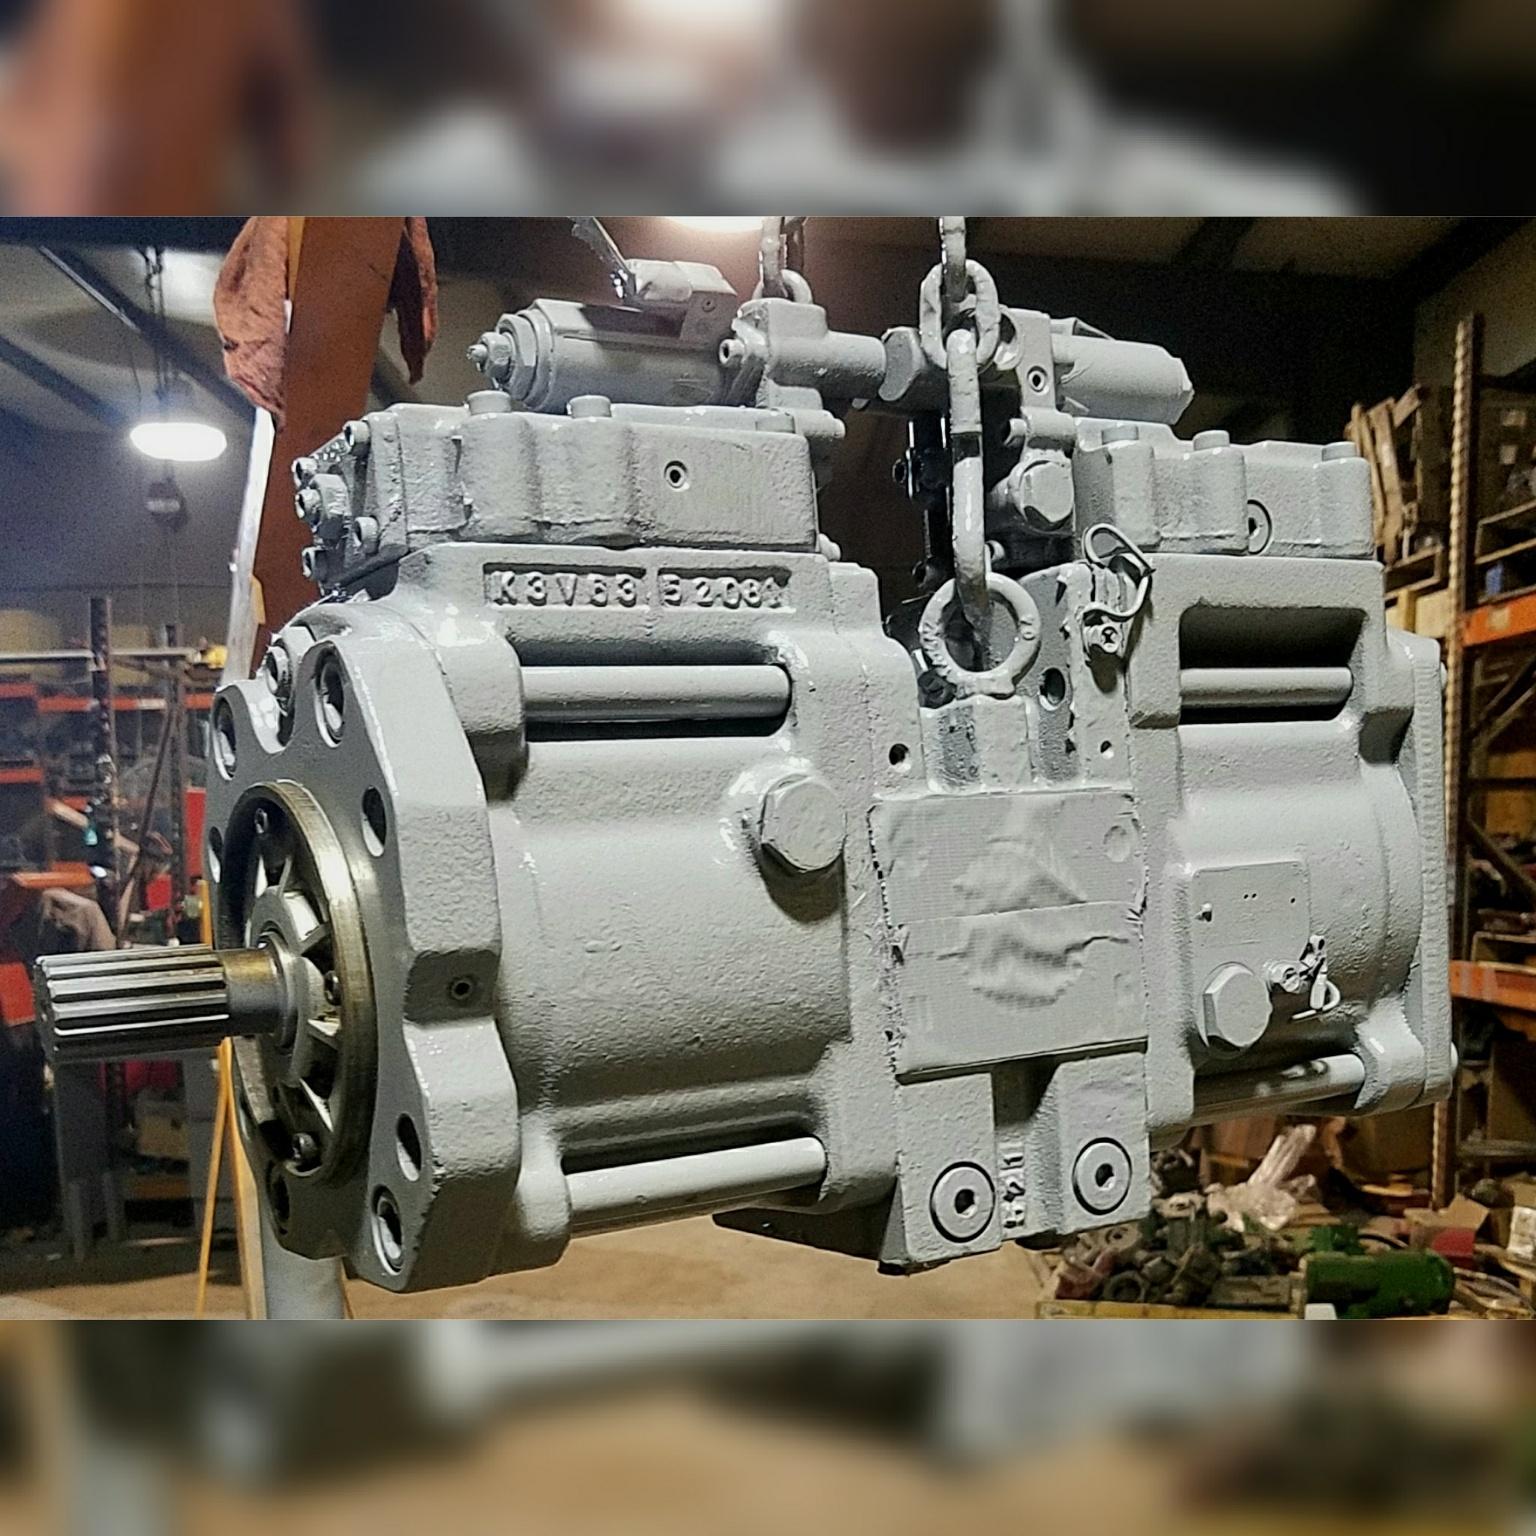 Hydrostatic Spraying Equipment